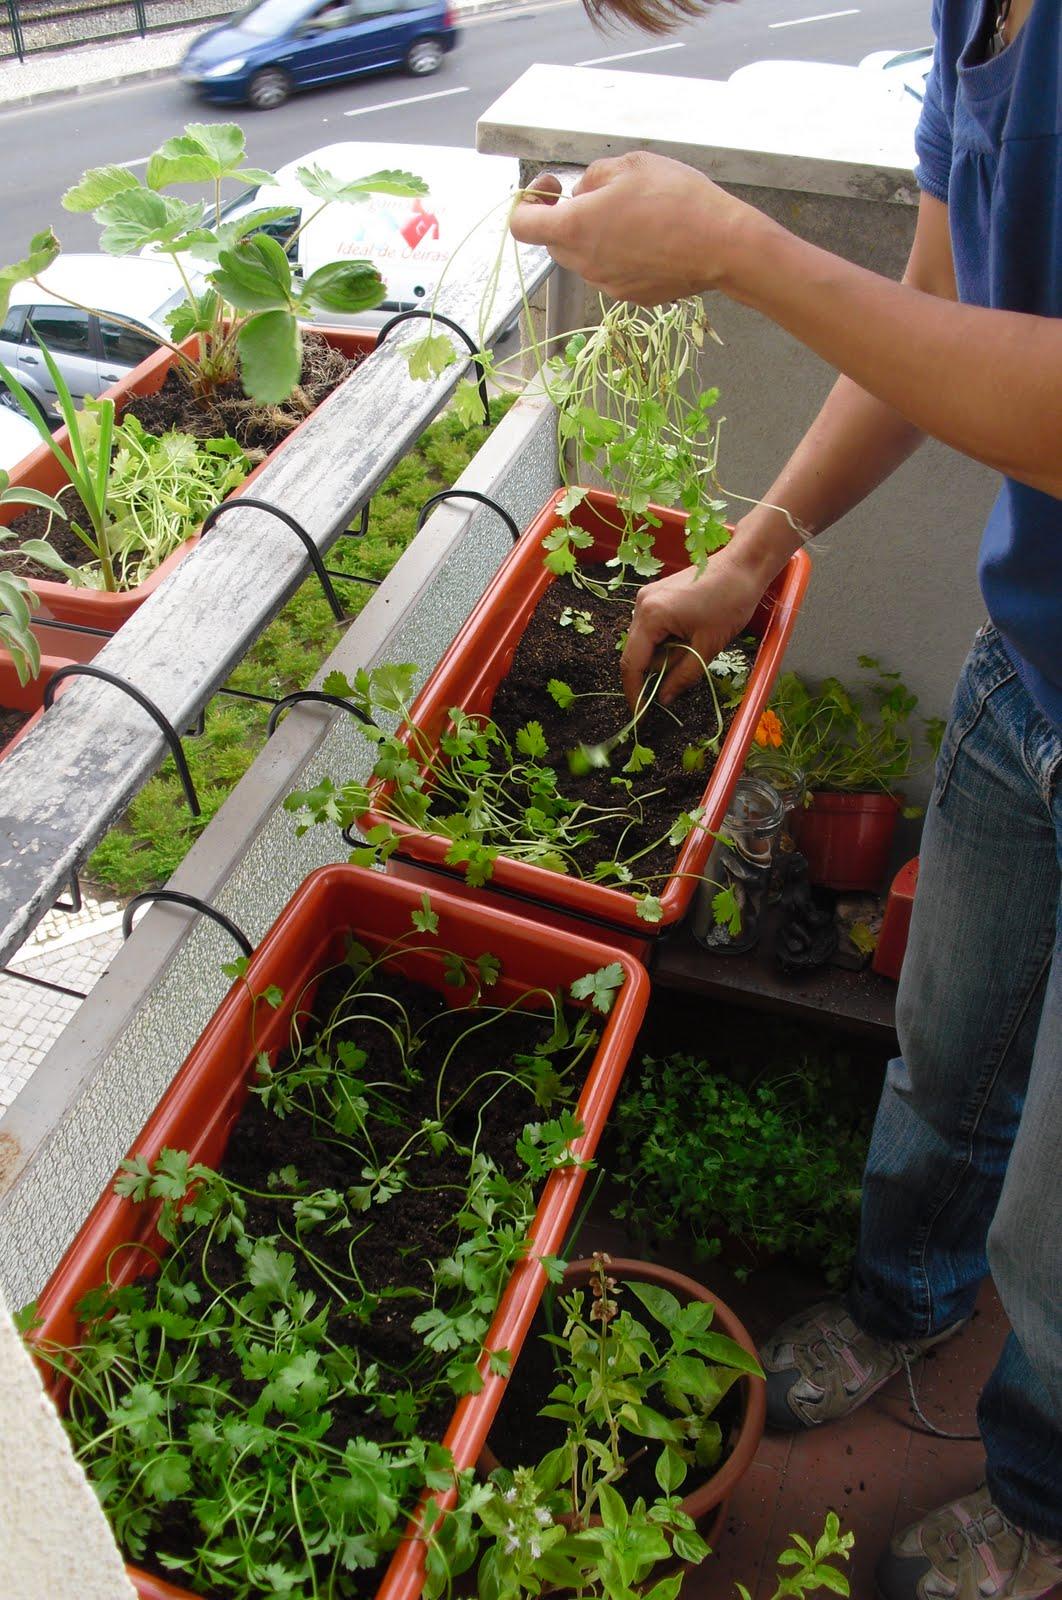 Ideias De Hortas ~ Horticultura Sustentável HORTA NA VARANDA